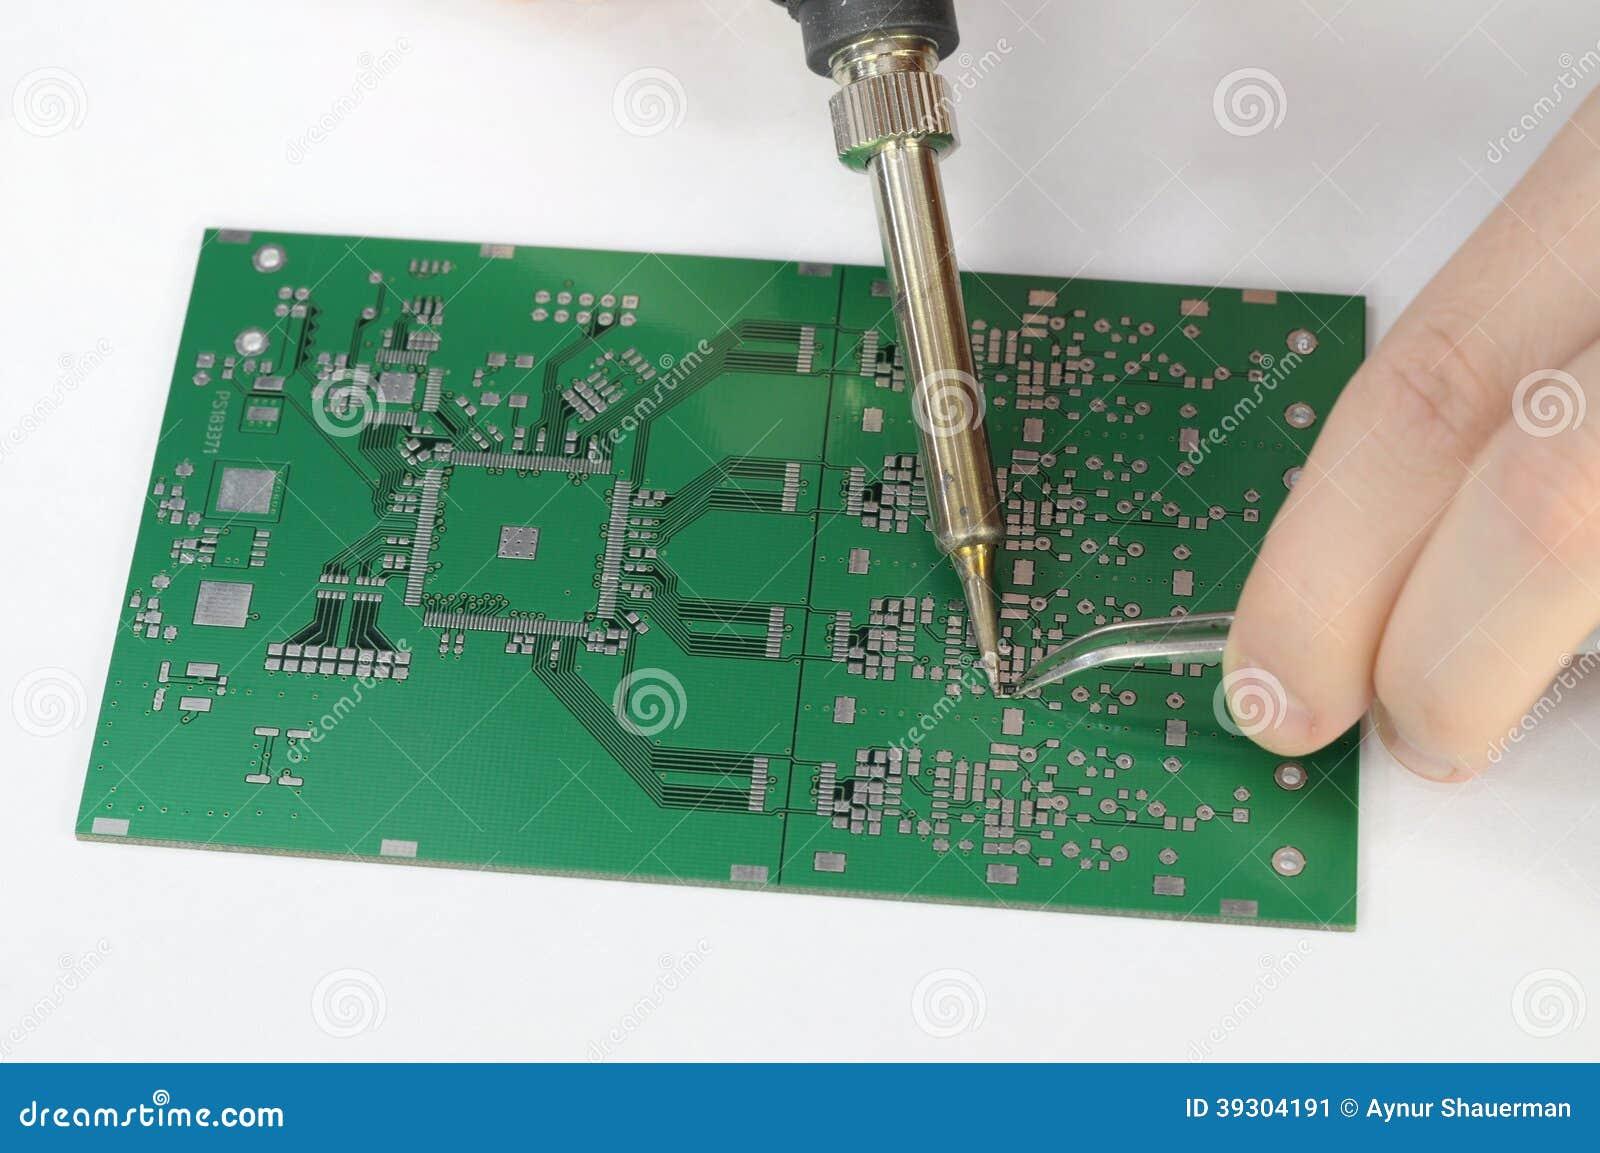 soldering resistor to printed circuit board stock photo image 39304191. Black Bedroom Furniture Sets. Home Design Ideas